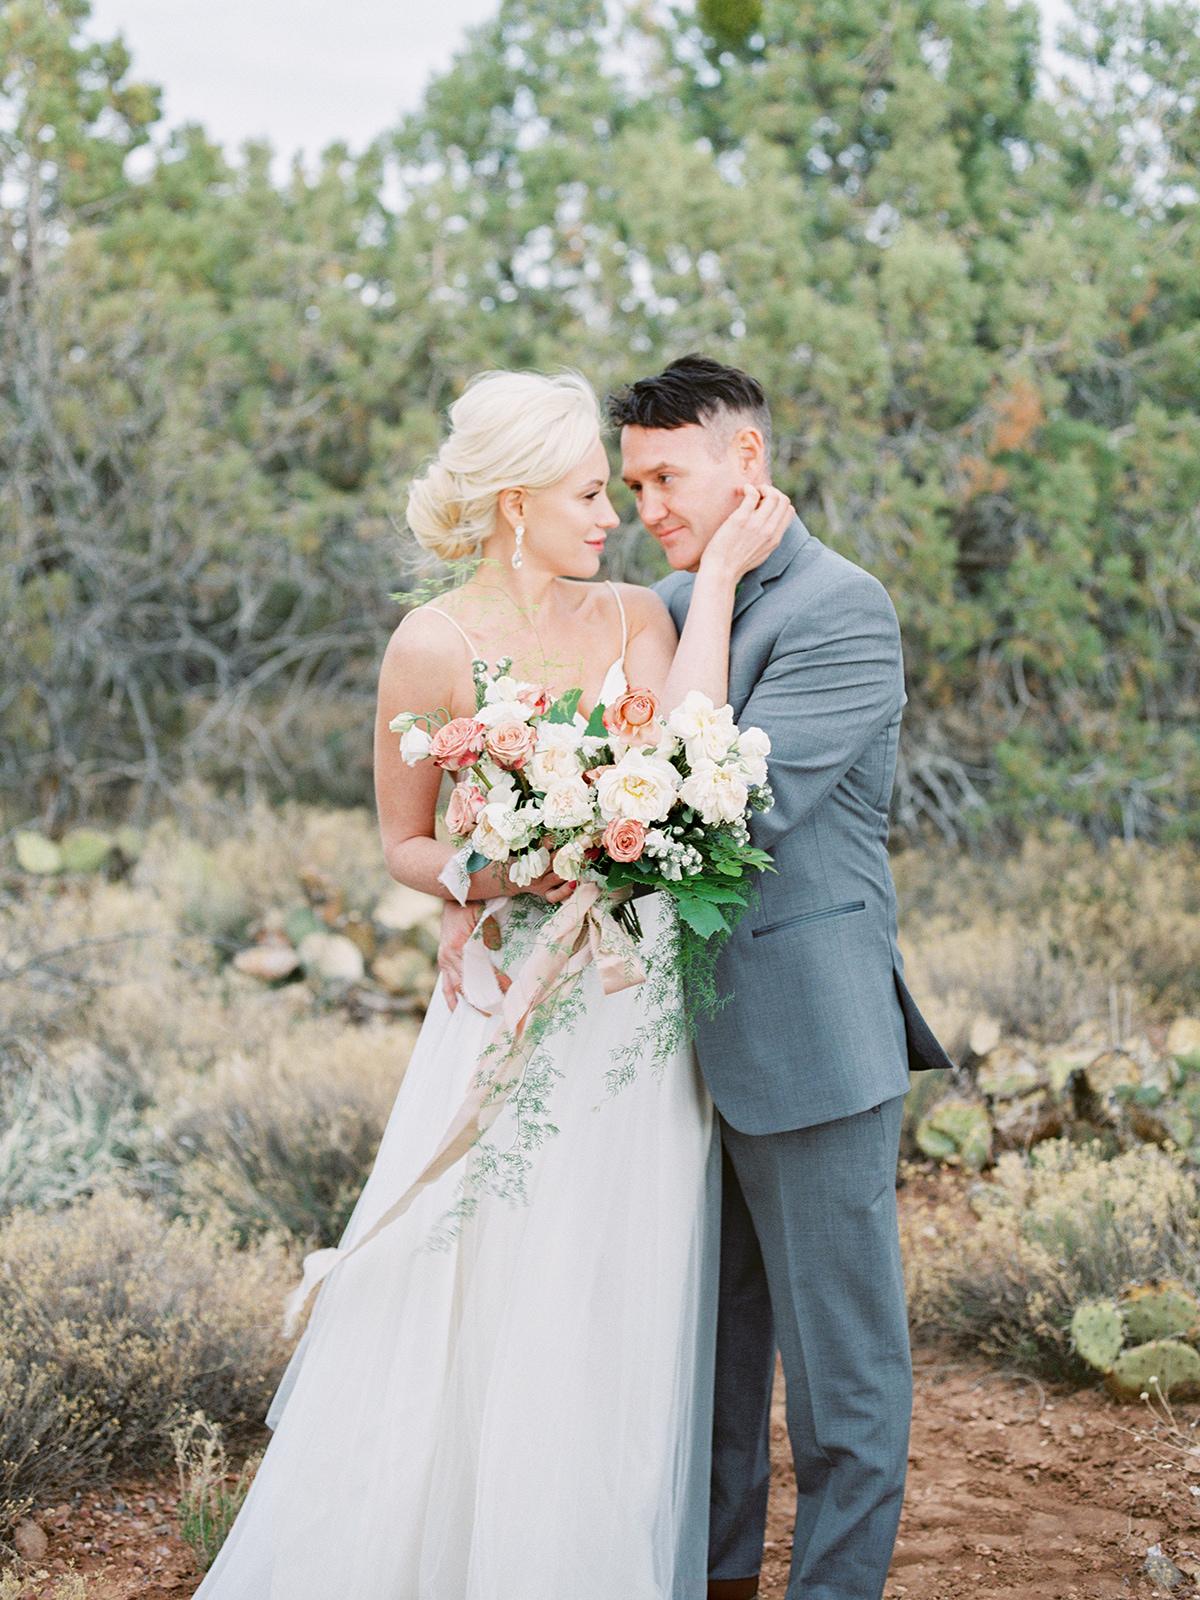 York Sedona Elopement - Ball Photo Co Fine Art Film Wedding Photography-65.jpg